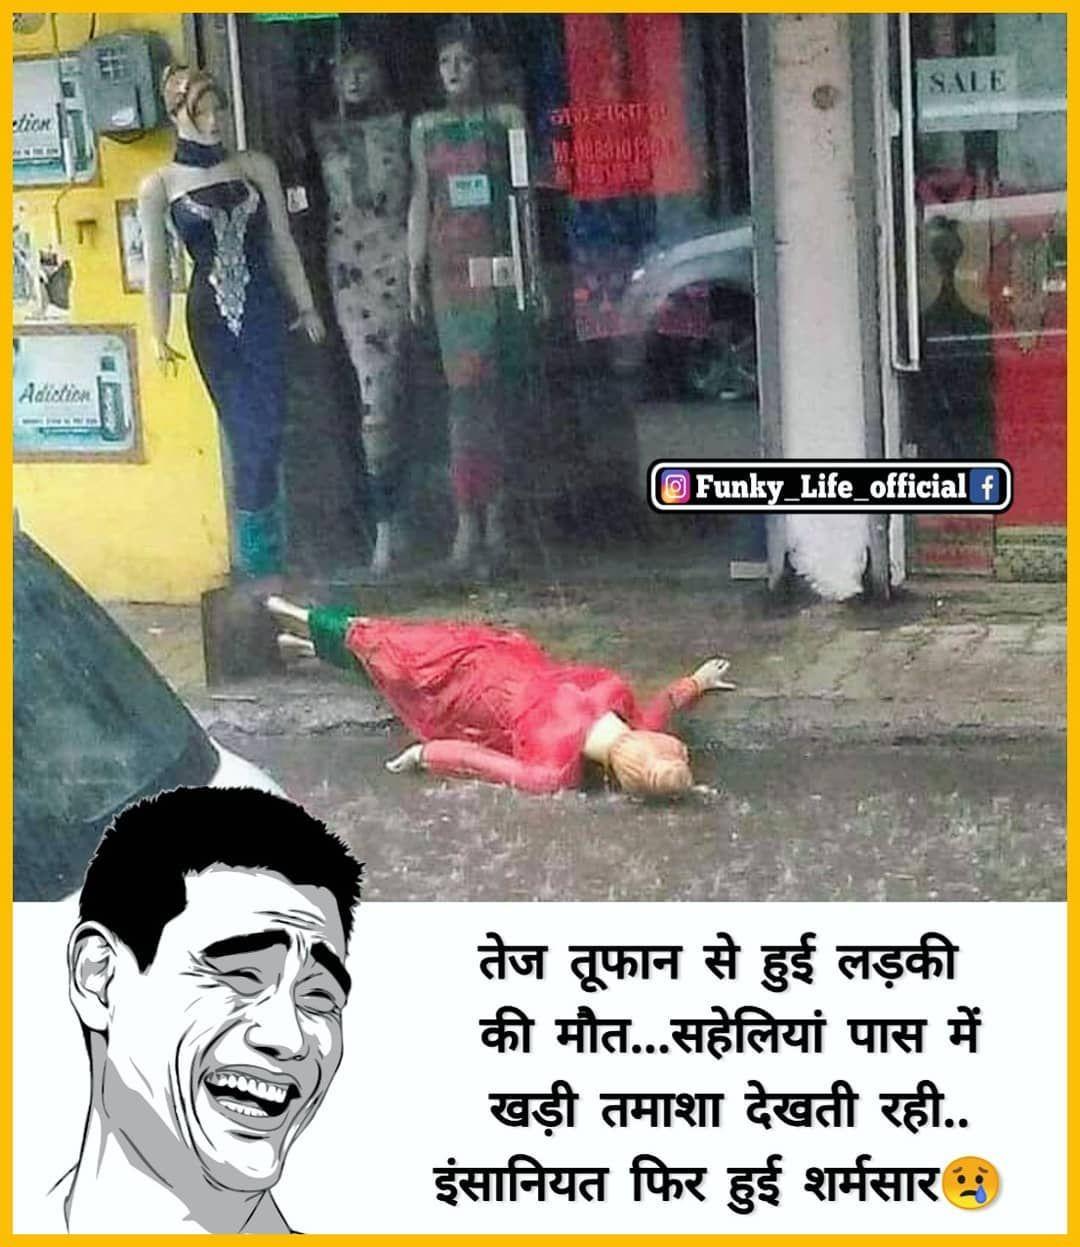 Pin By Deepak Mukhi On Hindi Jokes Funny Memes Images Crazy Funny Memes Cute Jokes